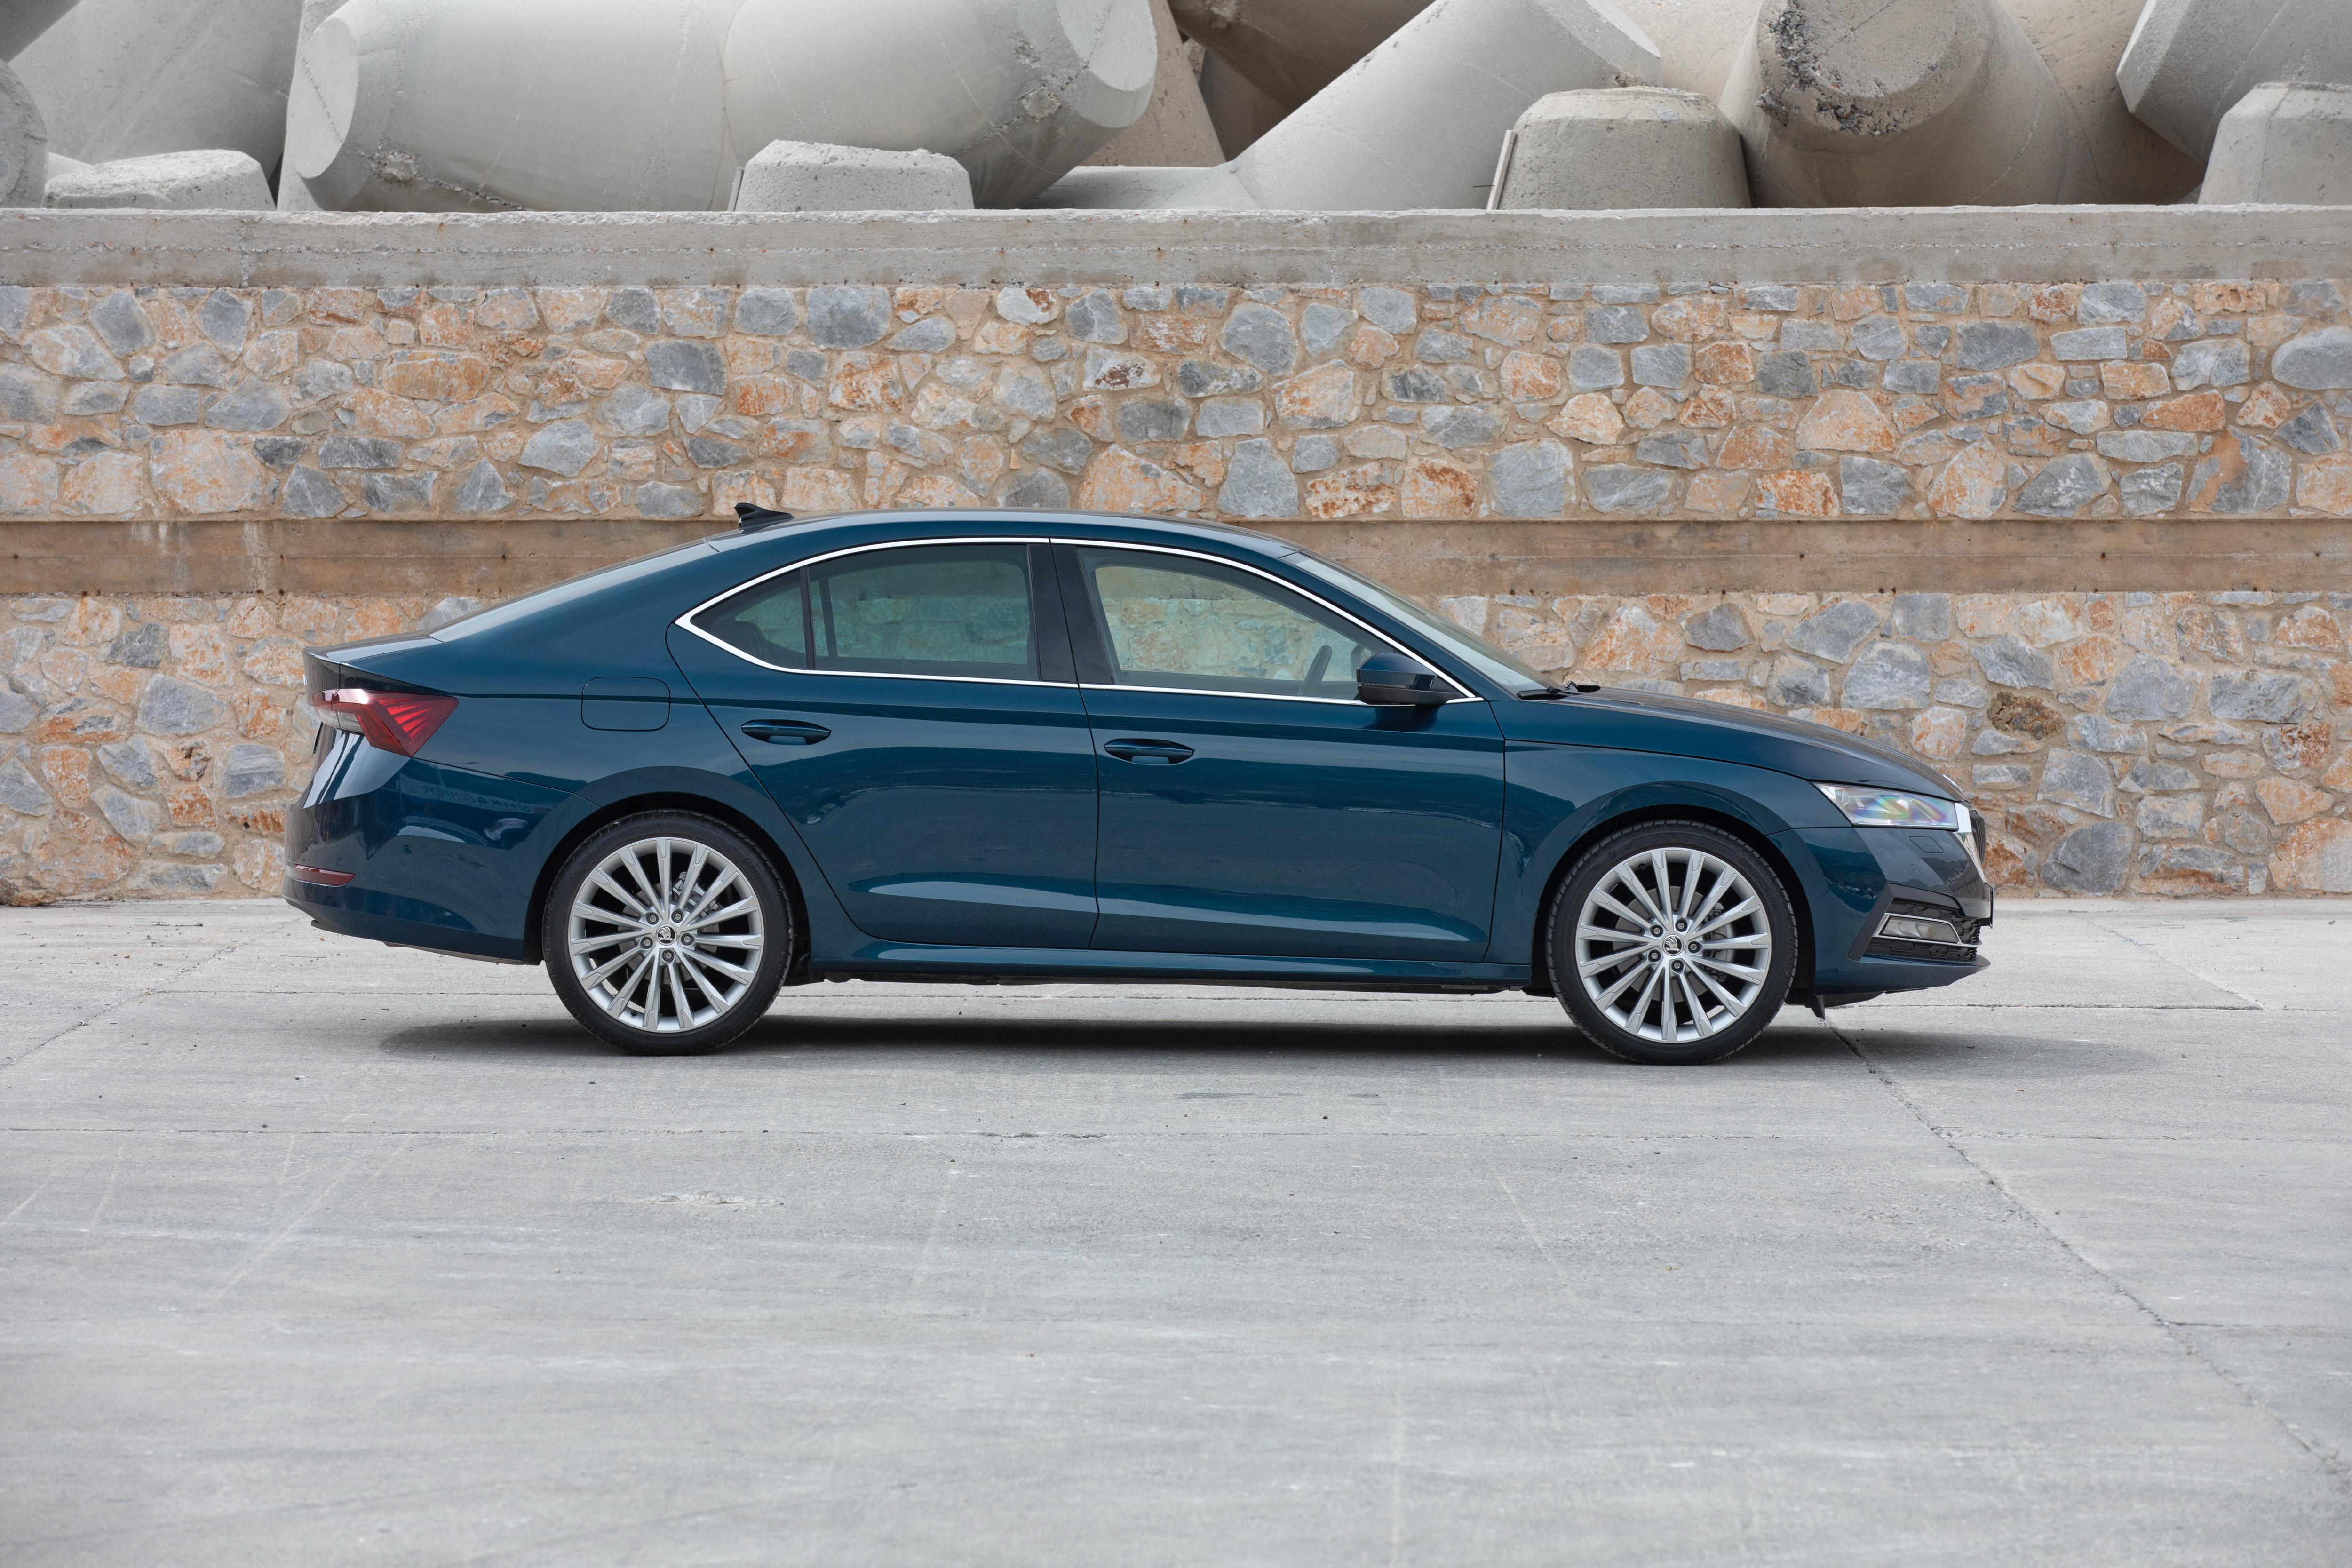 The all-new SKODA OCTAVIA: spacious, practical and elegant like a coupé - Image 7